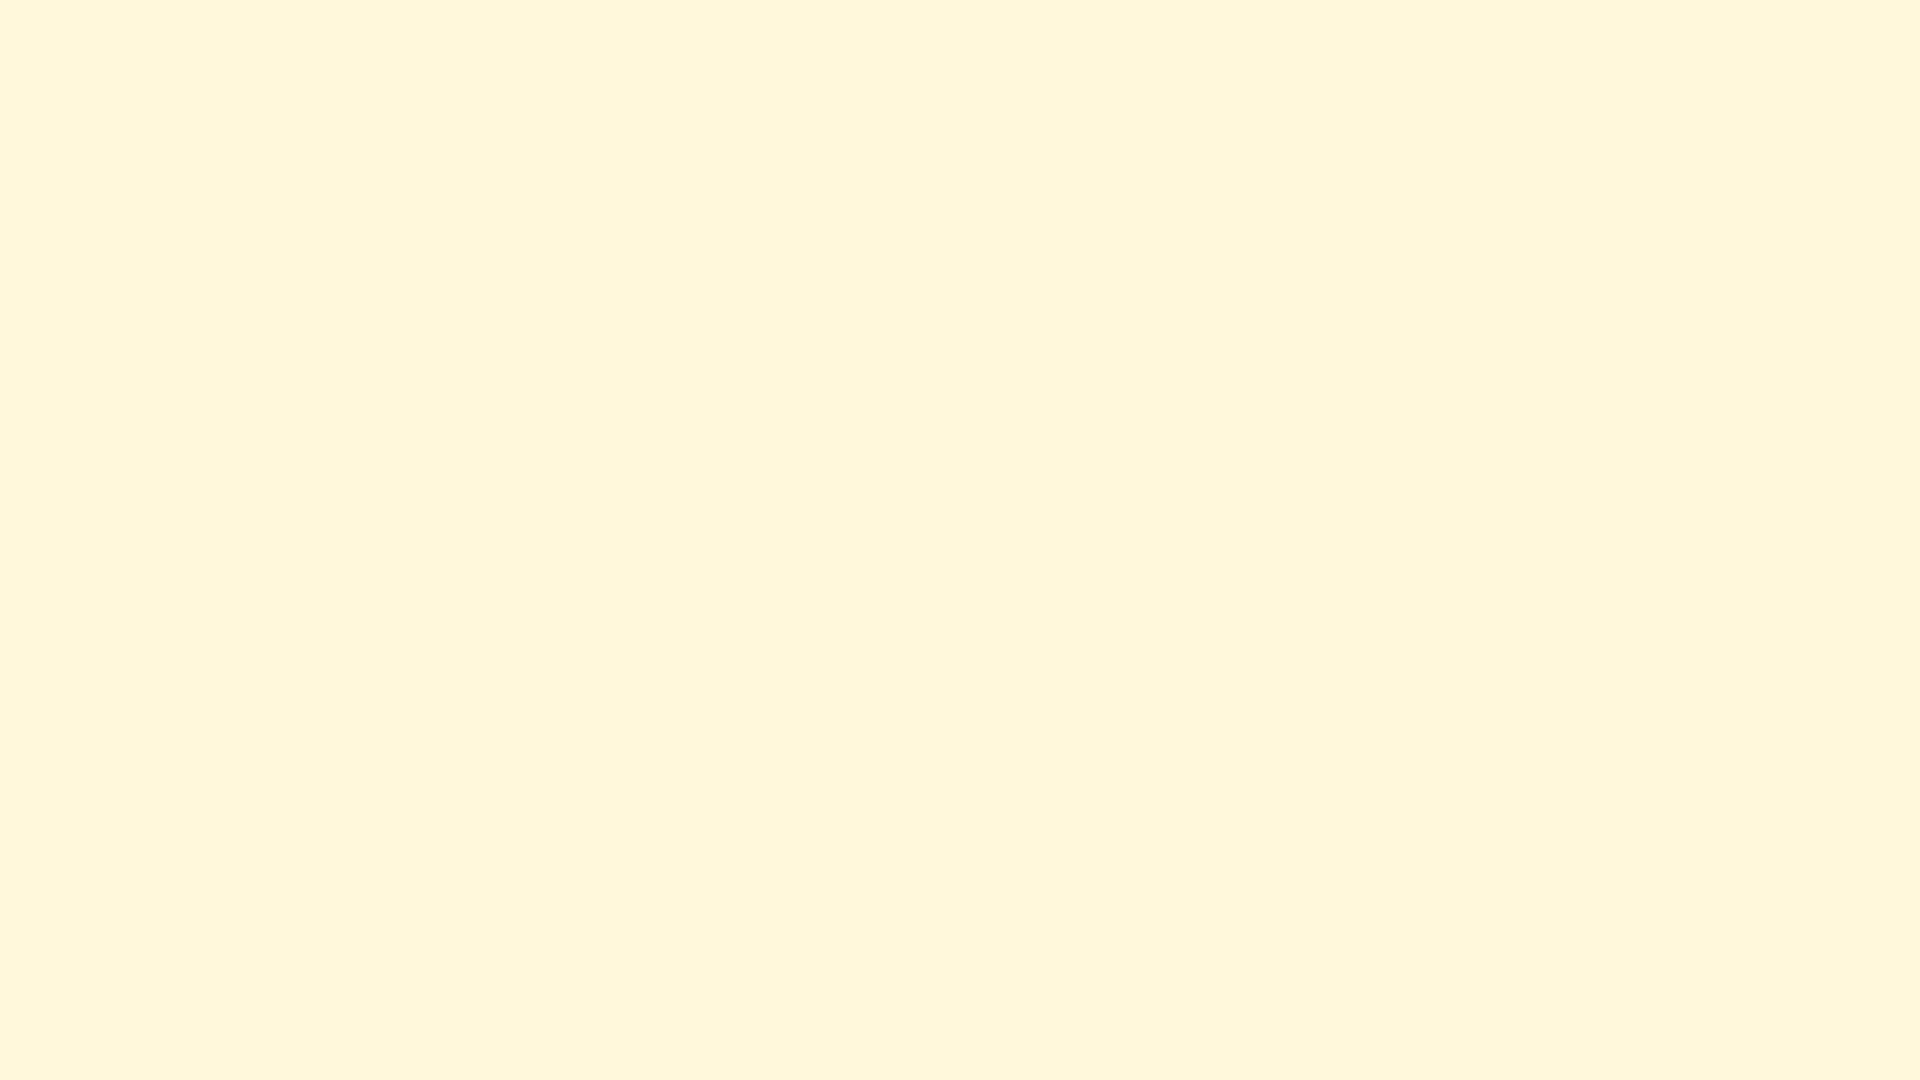 1920x1080 Cornsilk Solid Color Background